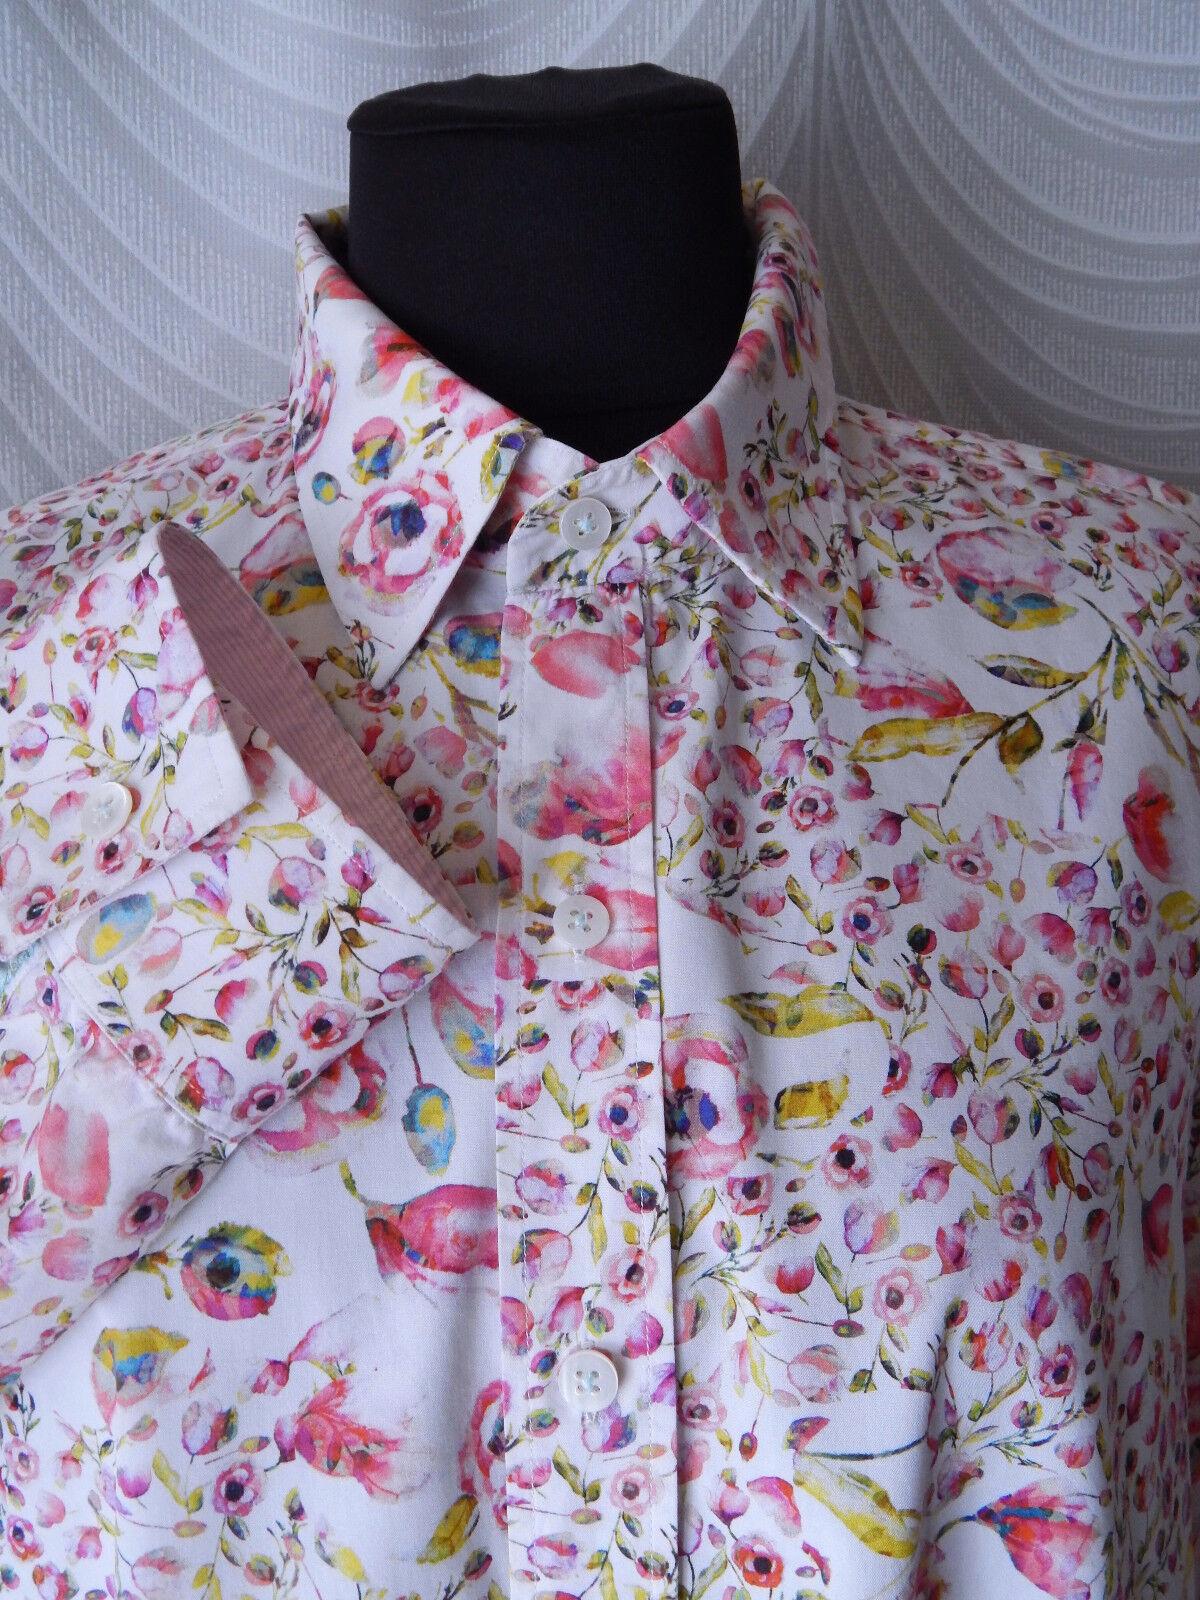 ✔1 Like Like Like No Other Floral Pattern Mens Shirt Größe 3XL | Speichern  | Rabatt  bab6f1